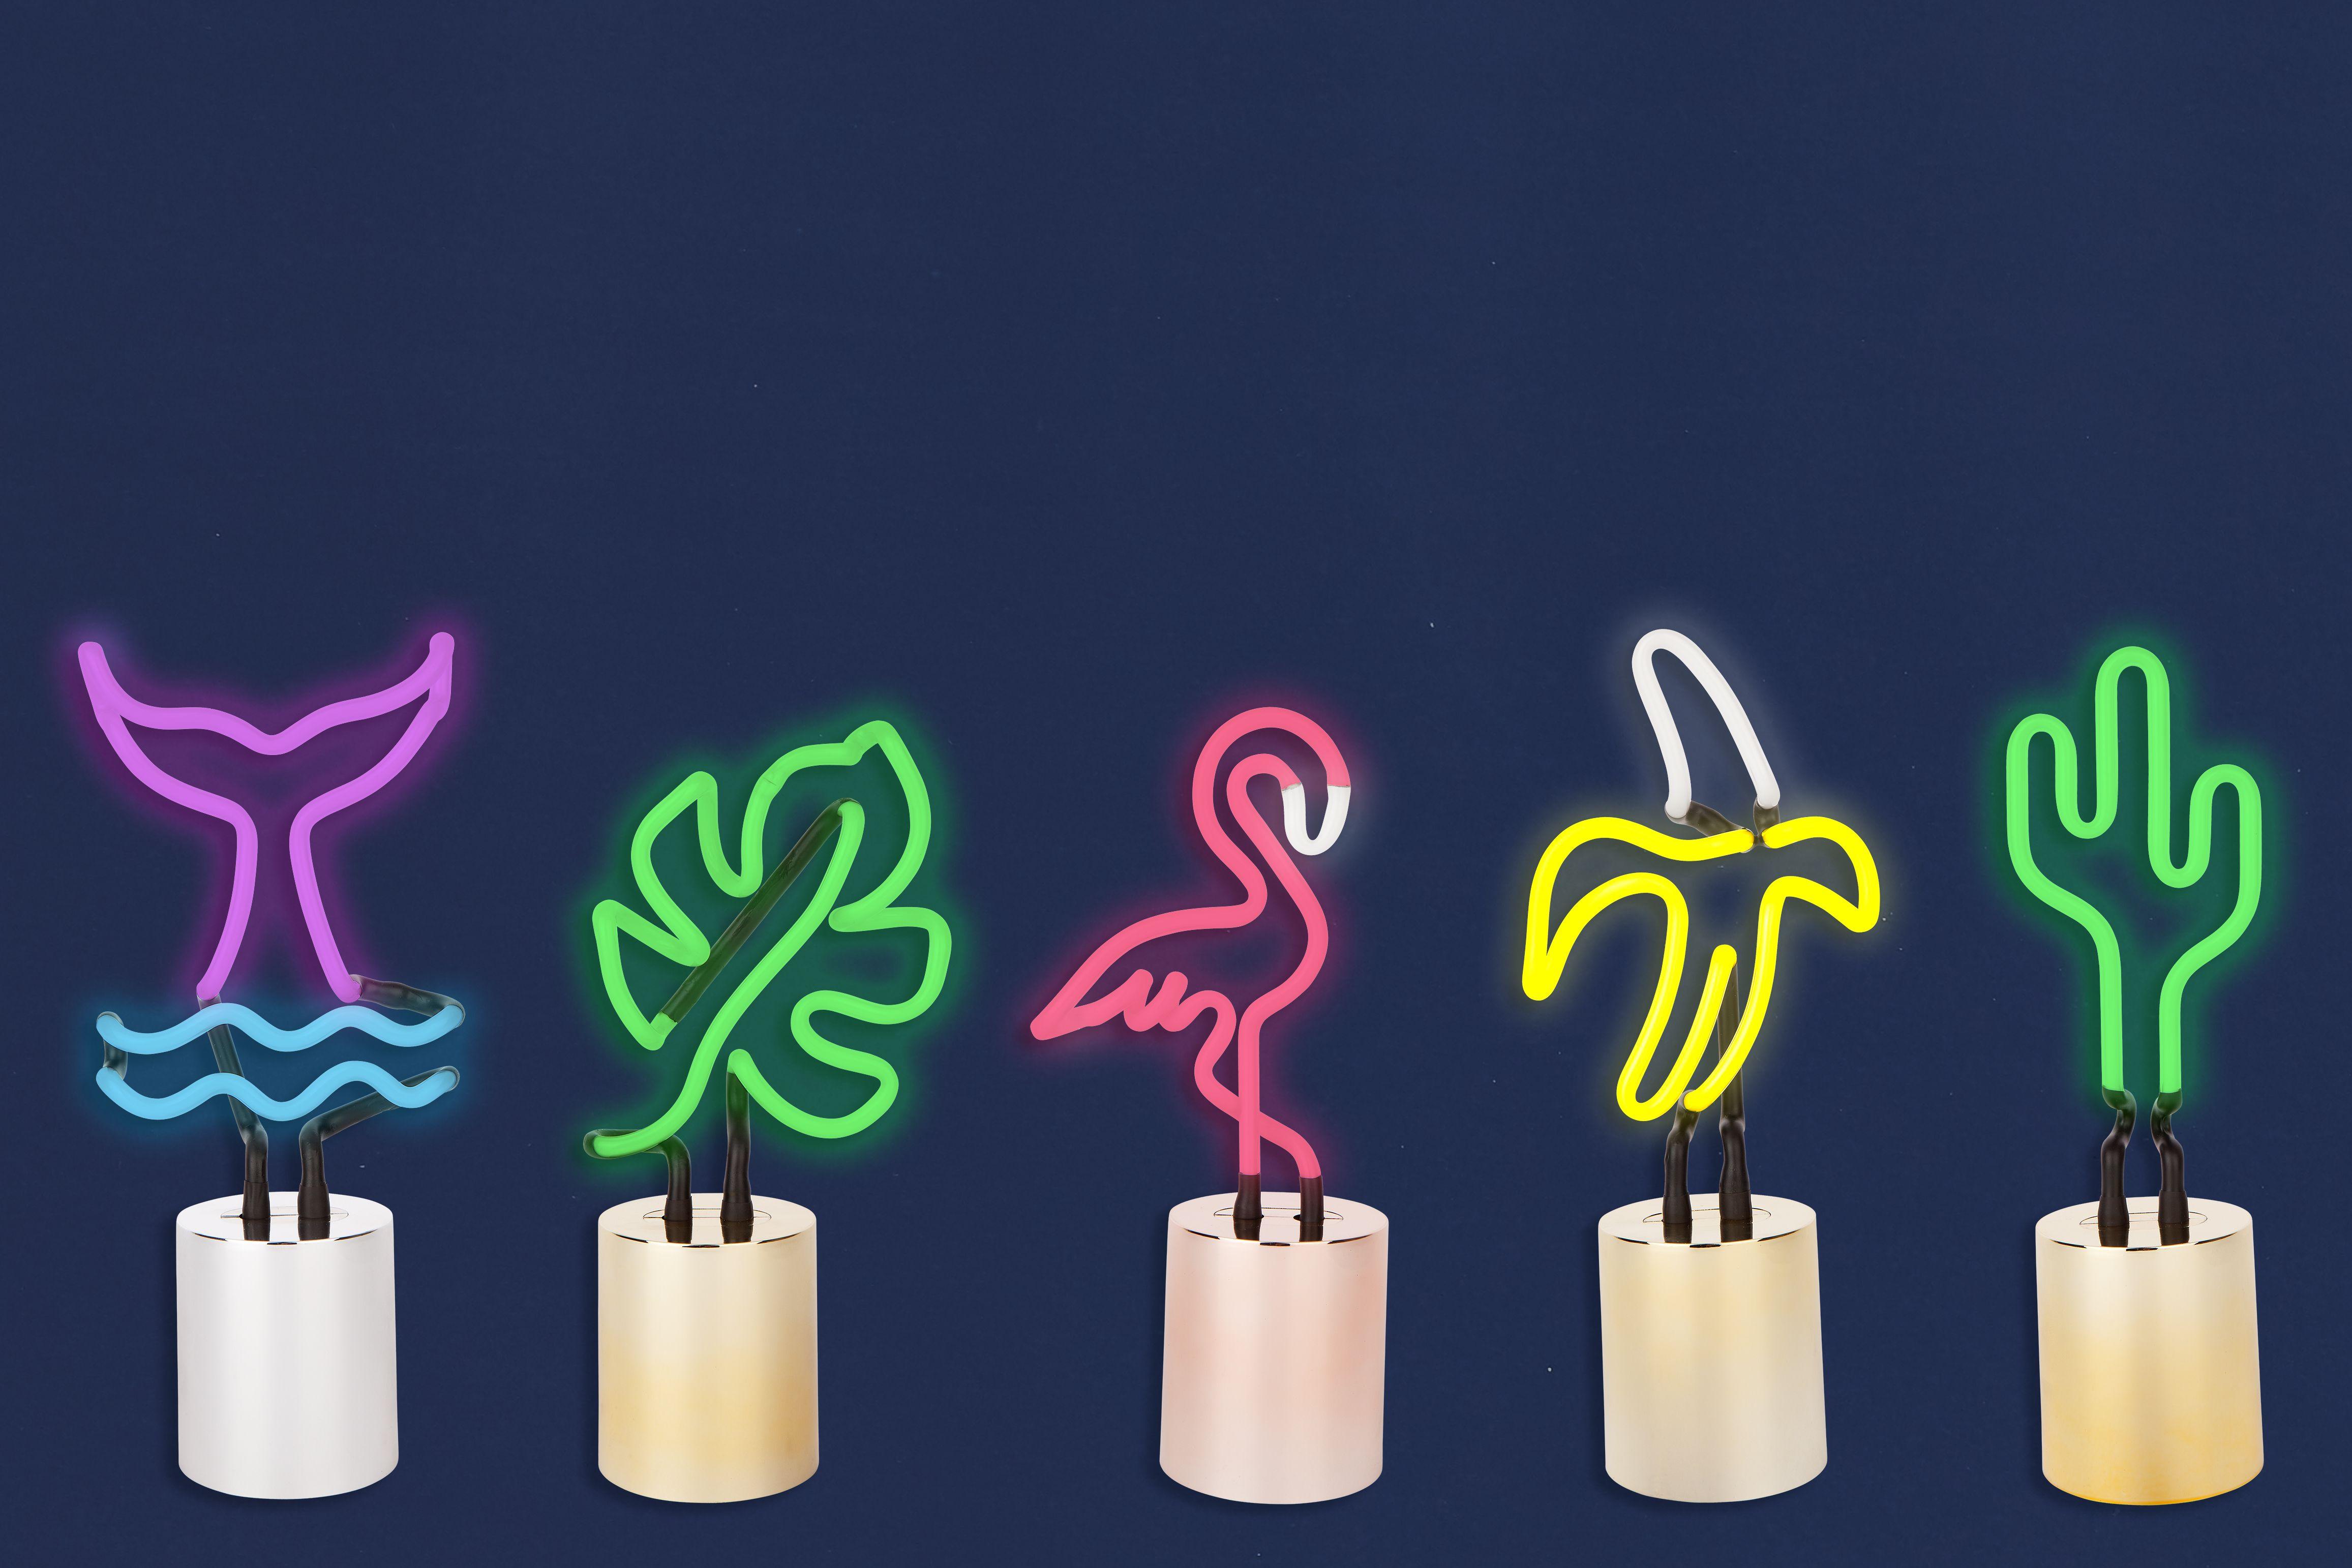 S1819 Neon Lights small Neon lighting, Fairy lights